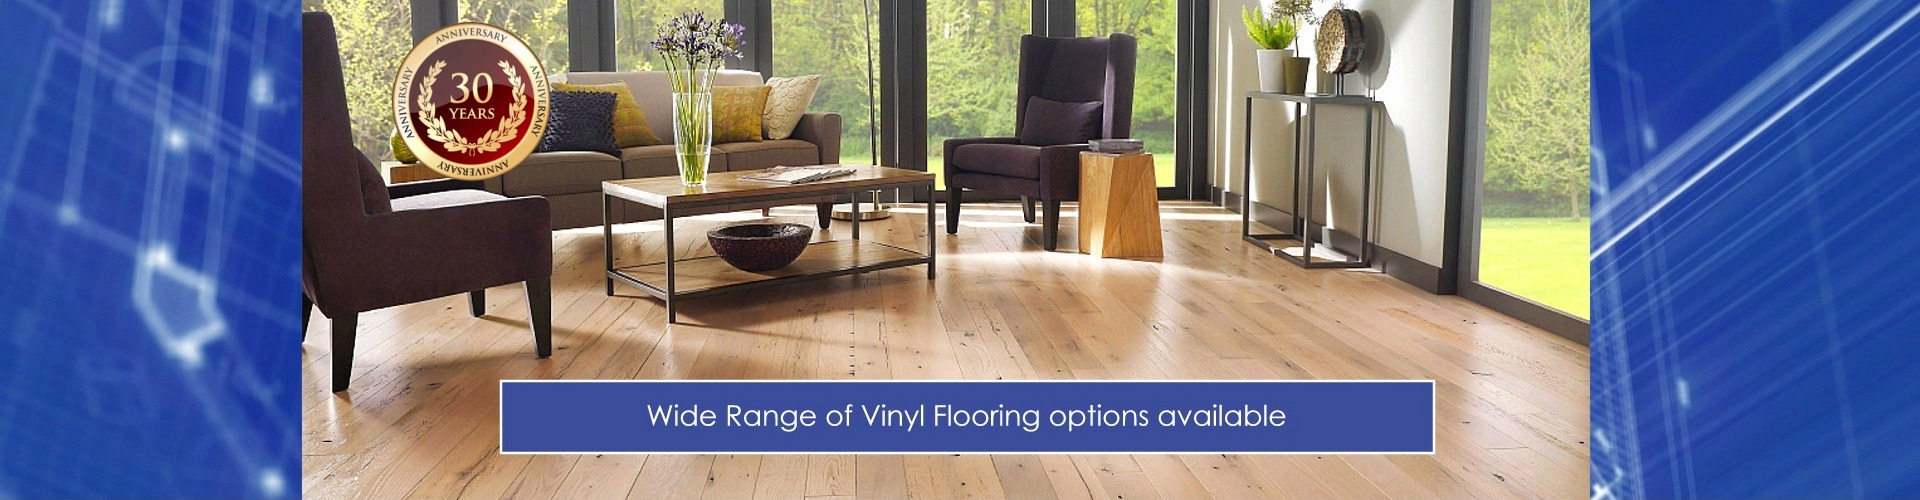 Coolmine Carpets Carpets Wooden Floors Vinyl Floors Dublin 15